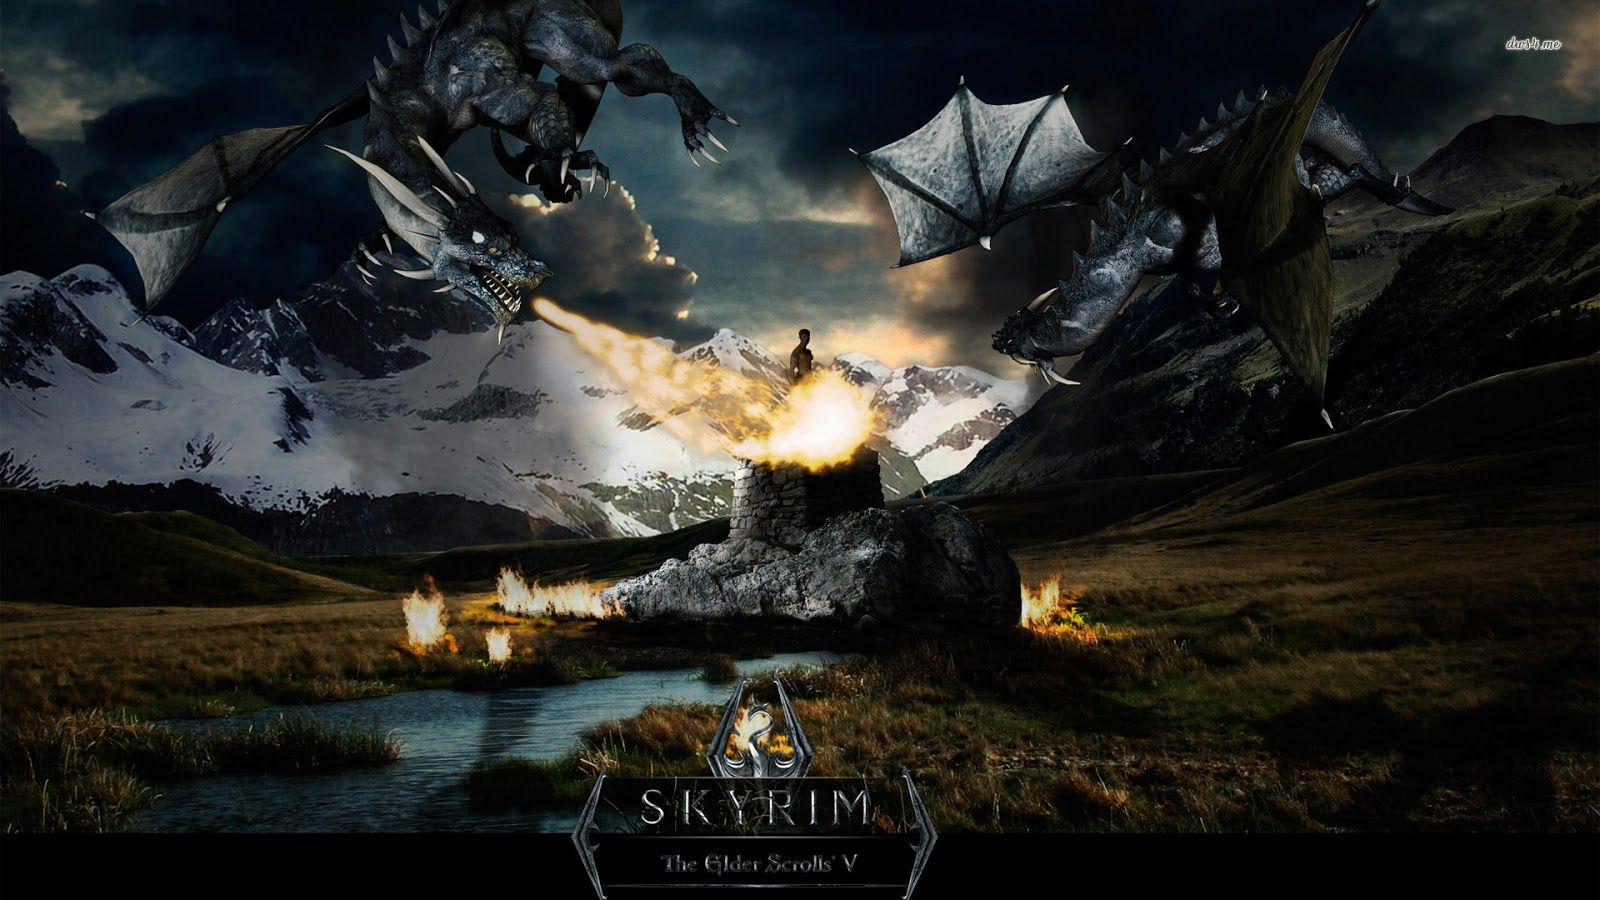 Skyrim Hd Wallpapers Backgrounds Papel De Parede Games Papel De Parede Roxo All Nature